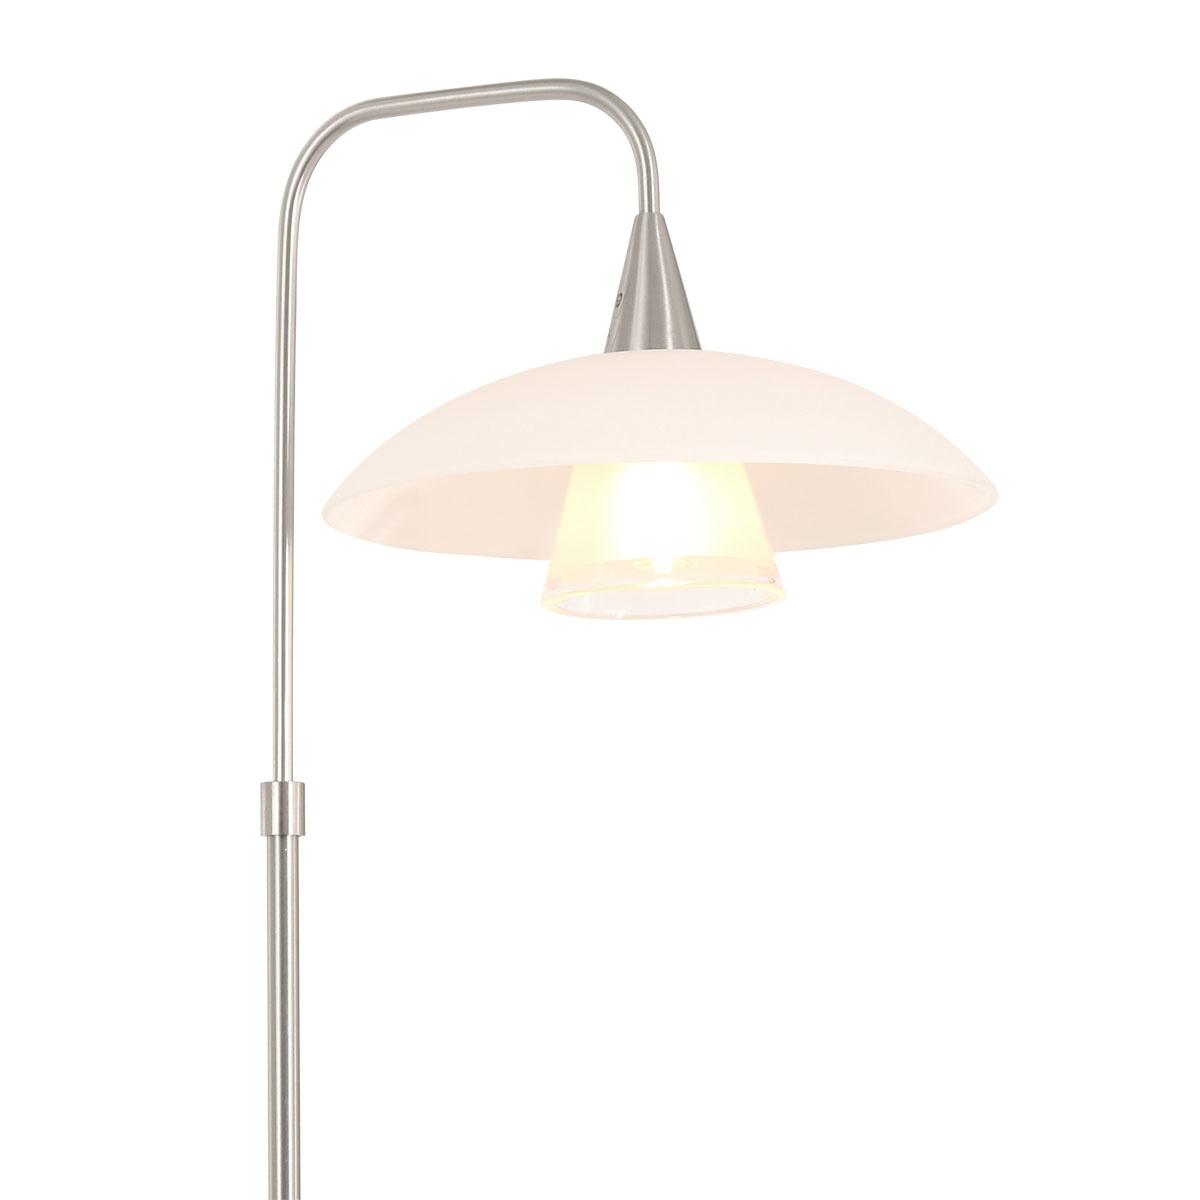 Steinhauer Tafellamp tallerken LED 2657st staal